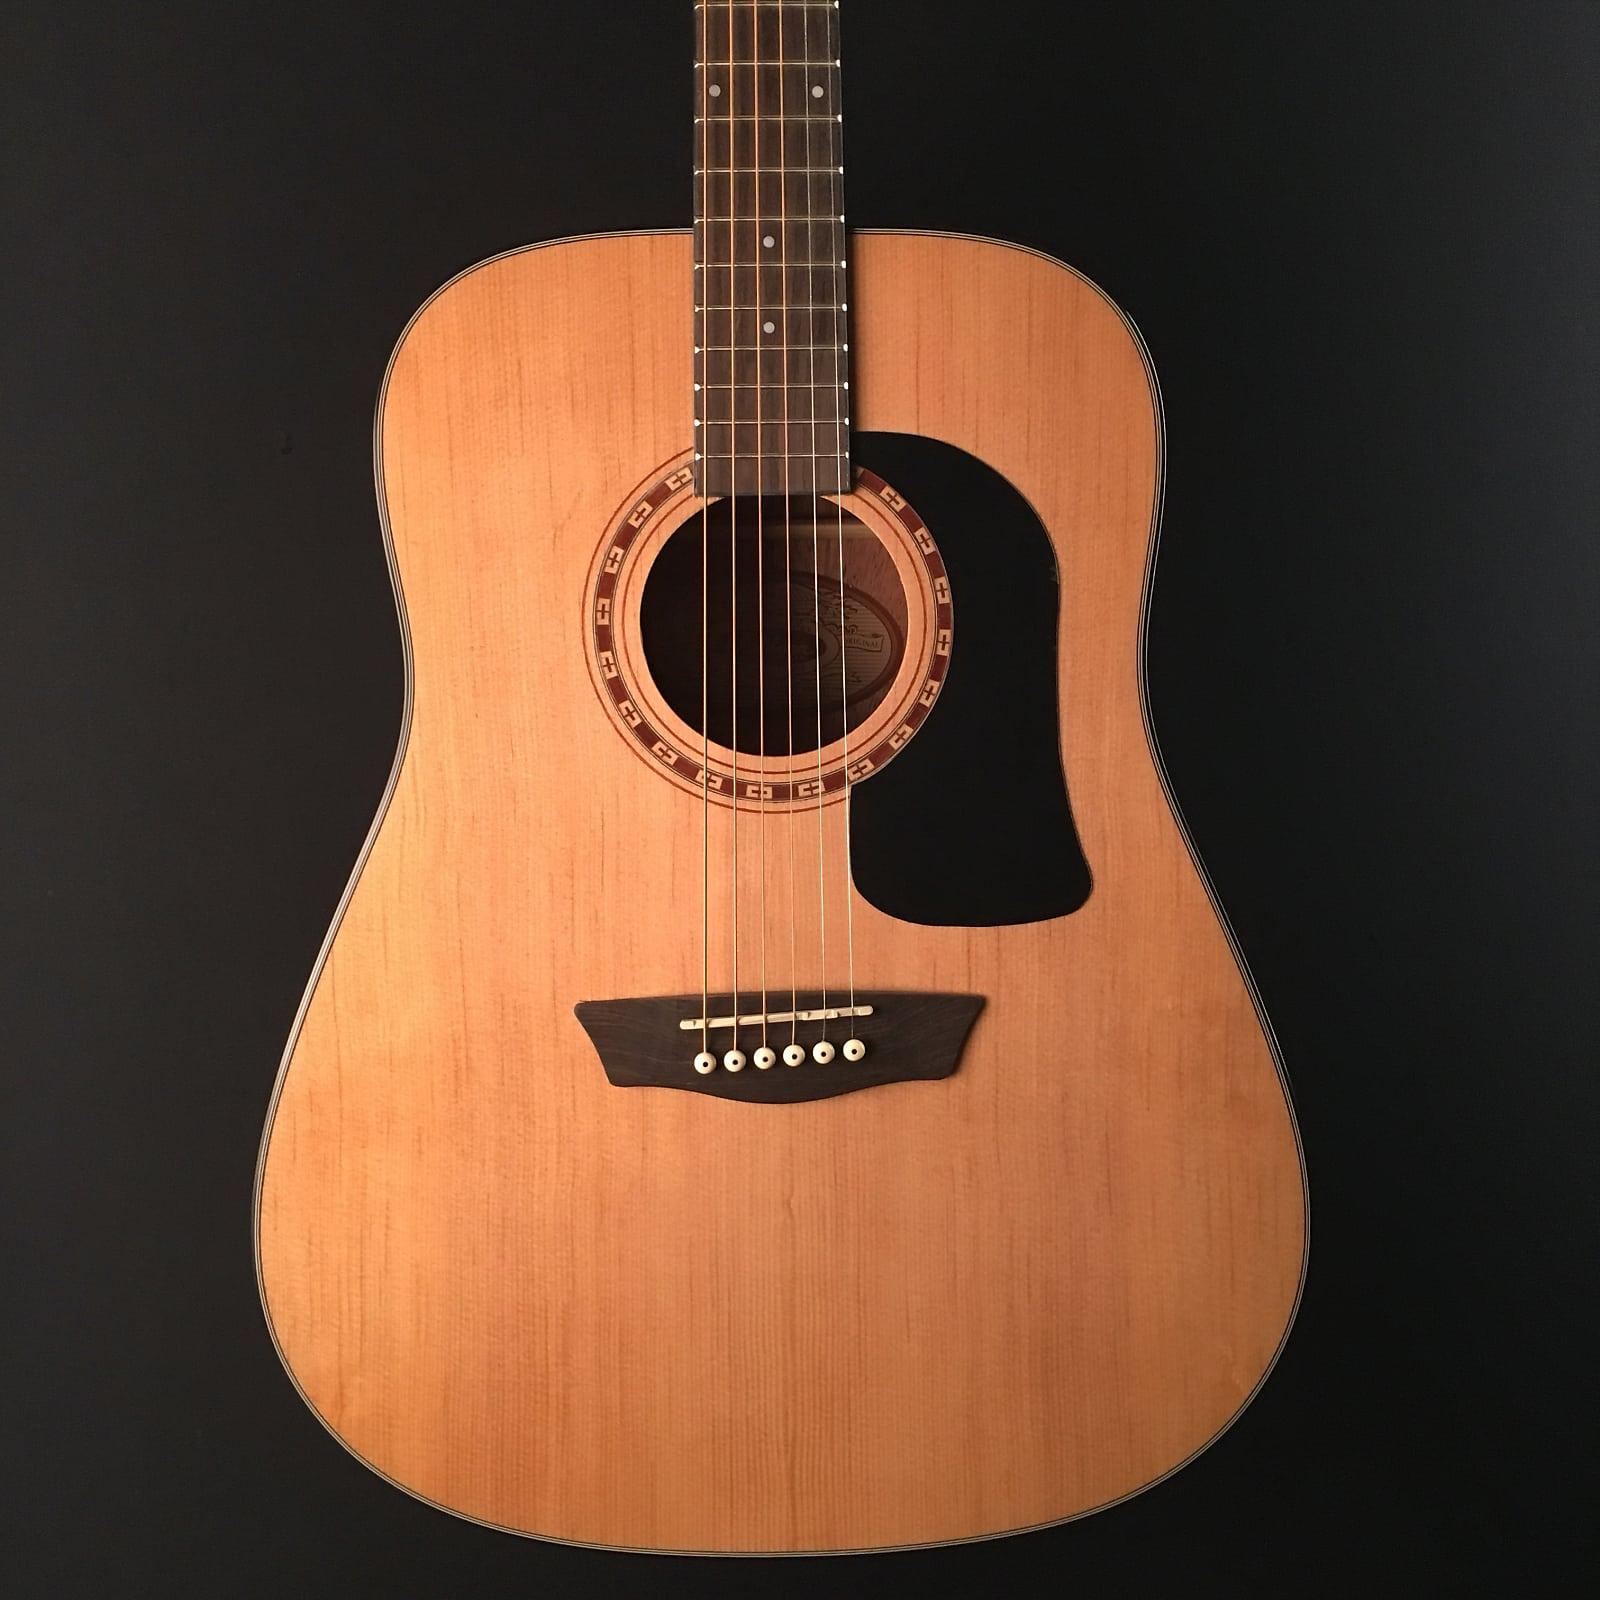 1e8c112371 Washburn AD5K Apprentice 5 Series Dreadnought Acoustic Guitar w ...